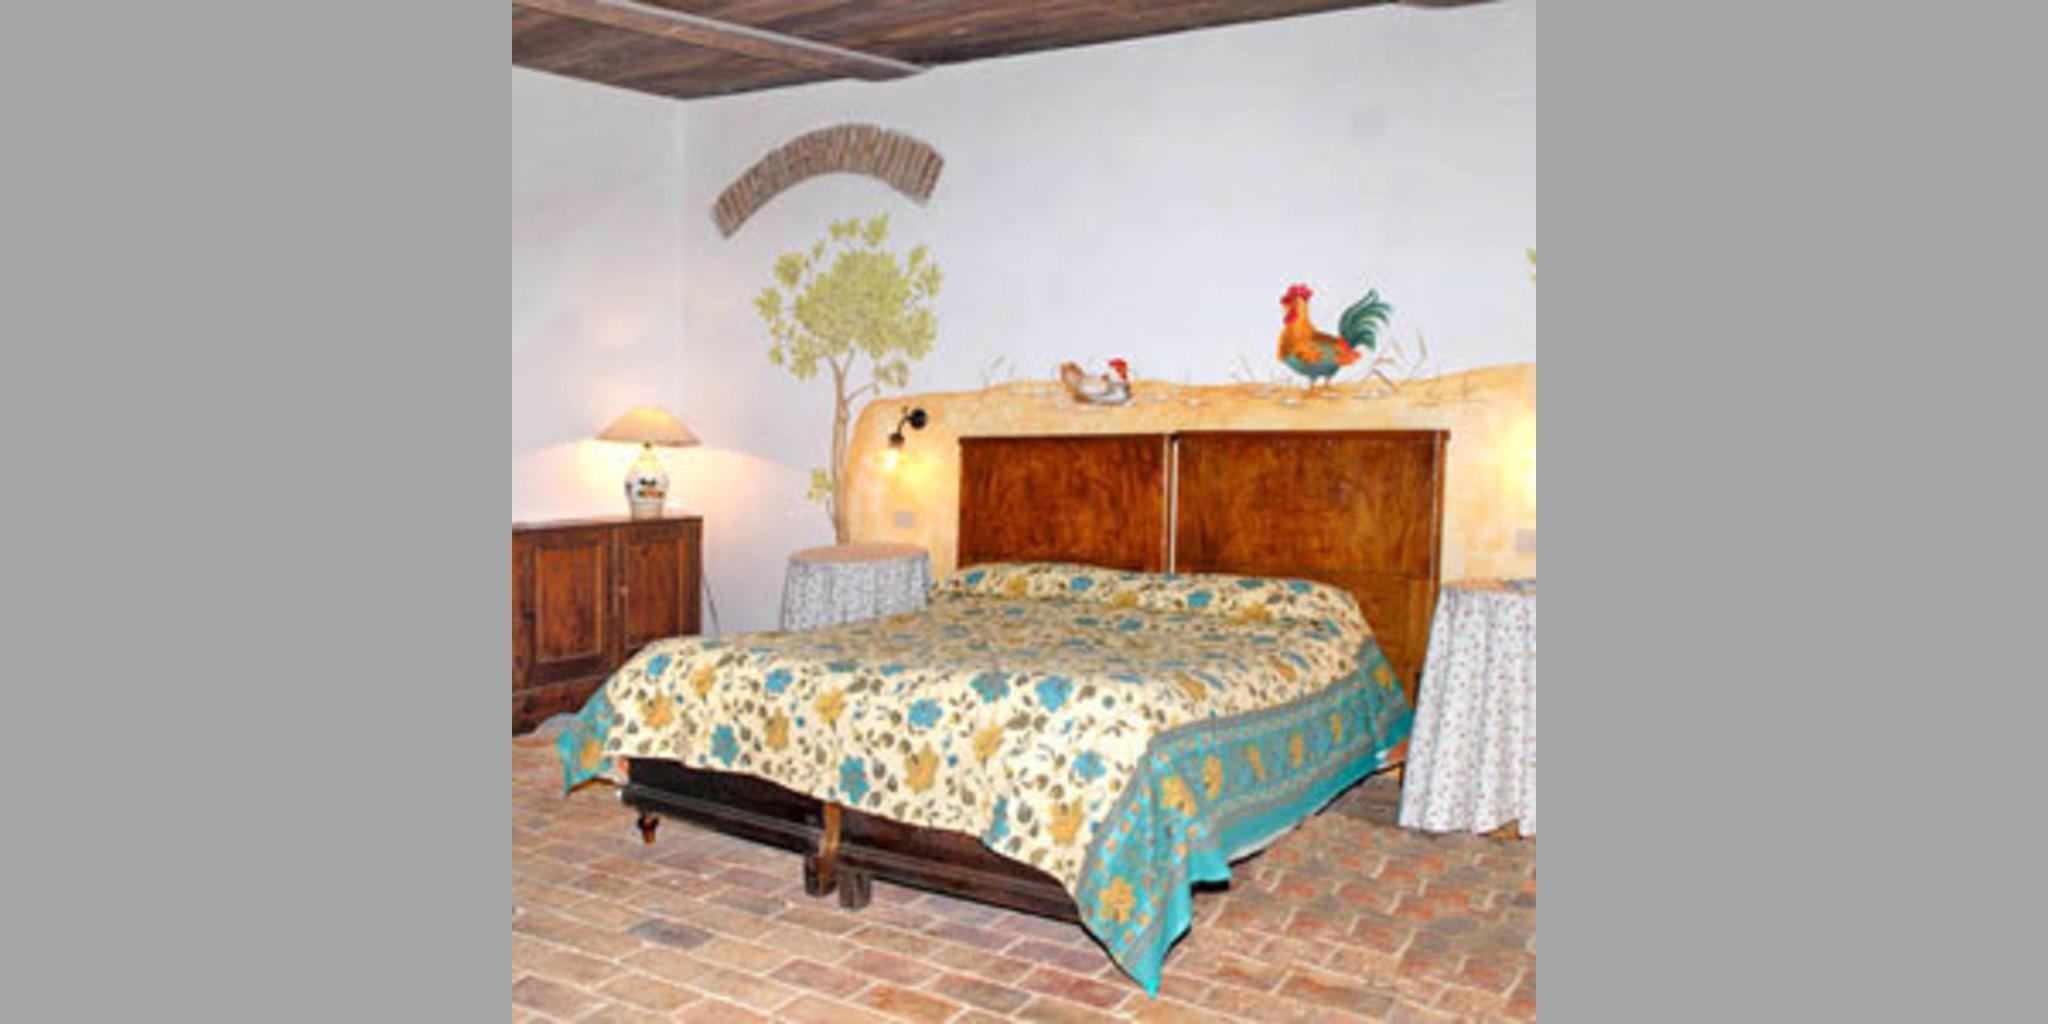 Bed & Breakfast Rossano - Contrada Amica